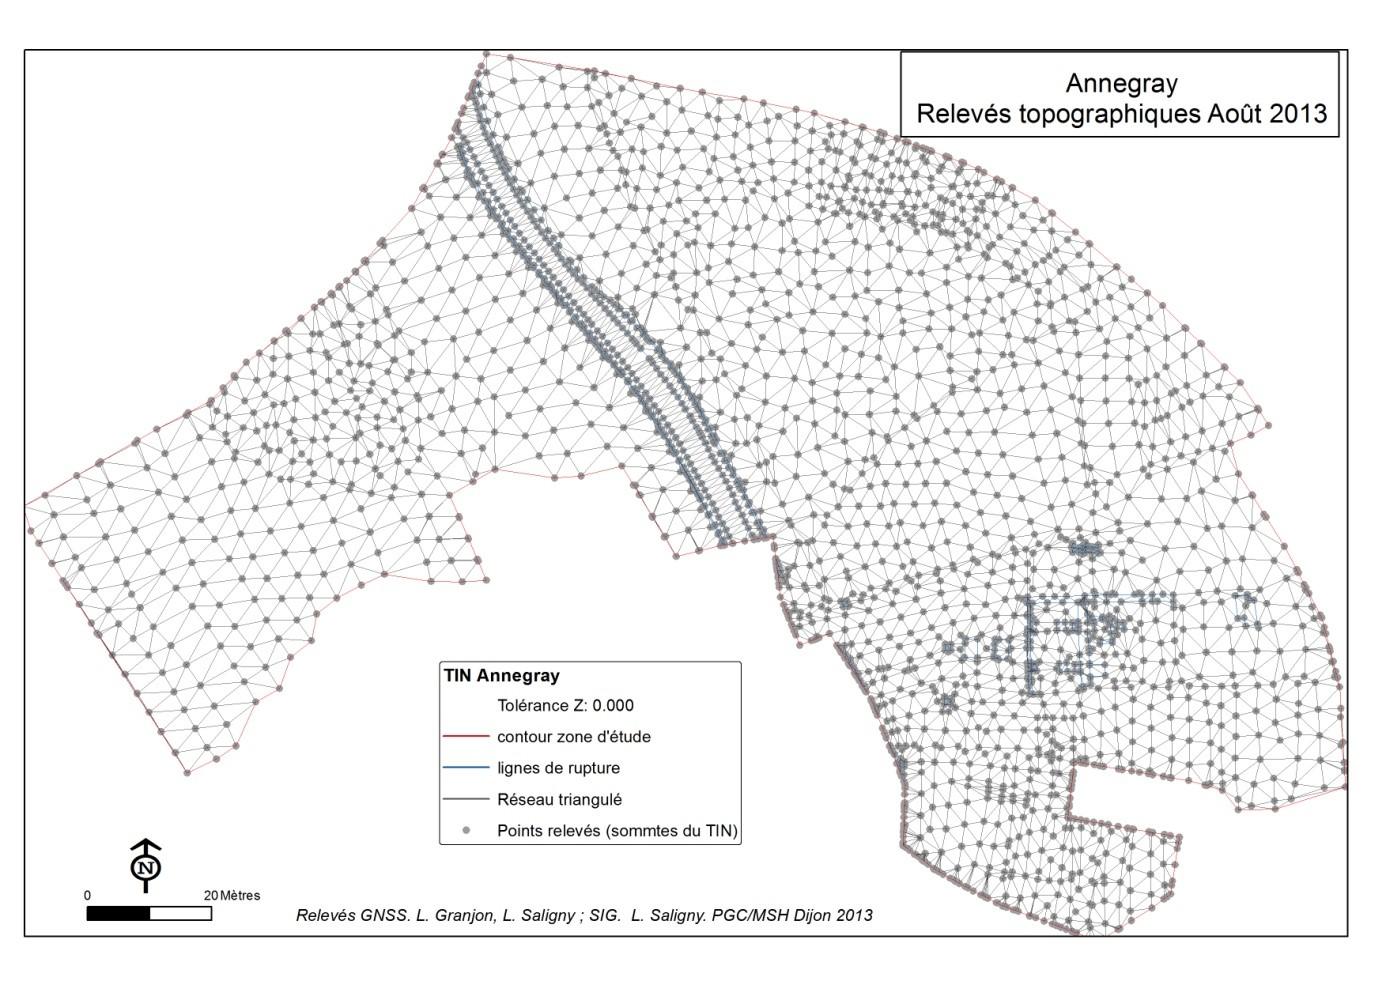 La Production du TIN (Triangular Irregular Network)